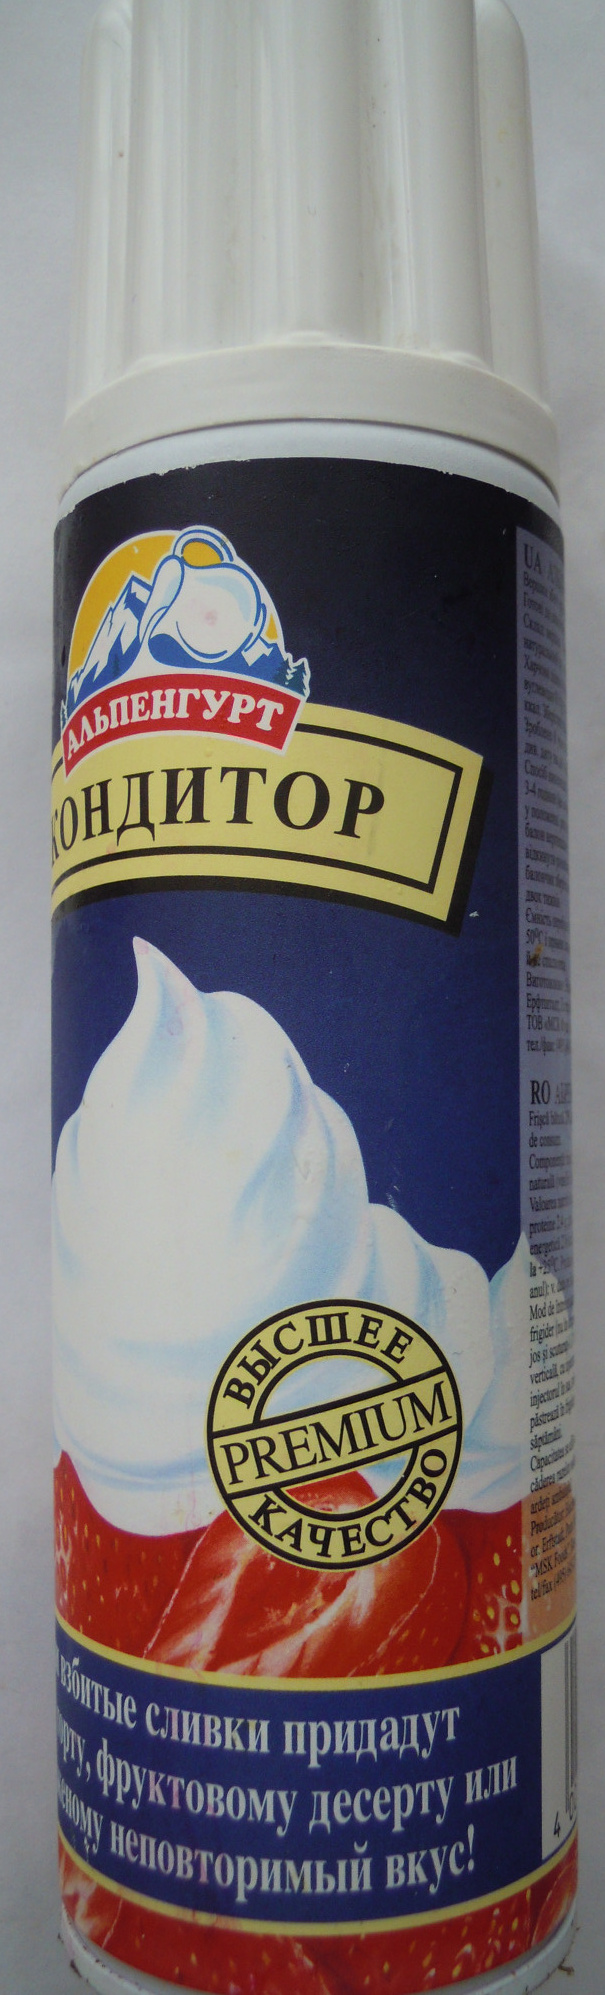 Кондитор - Product - ru